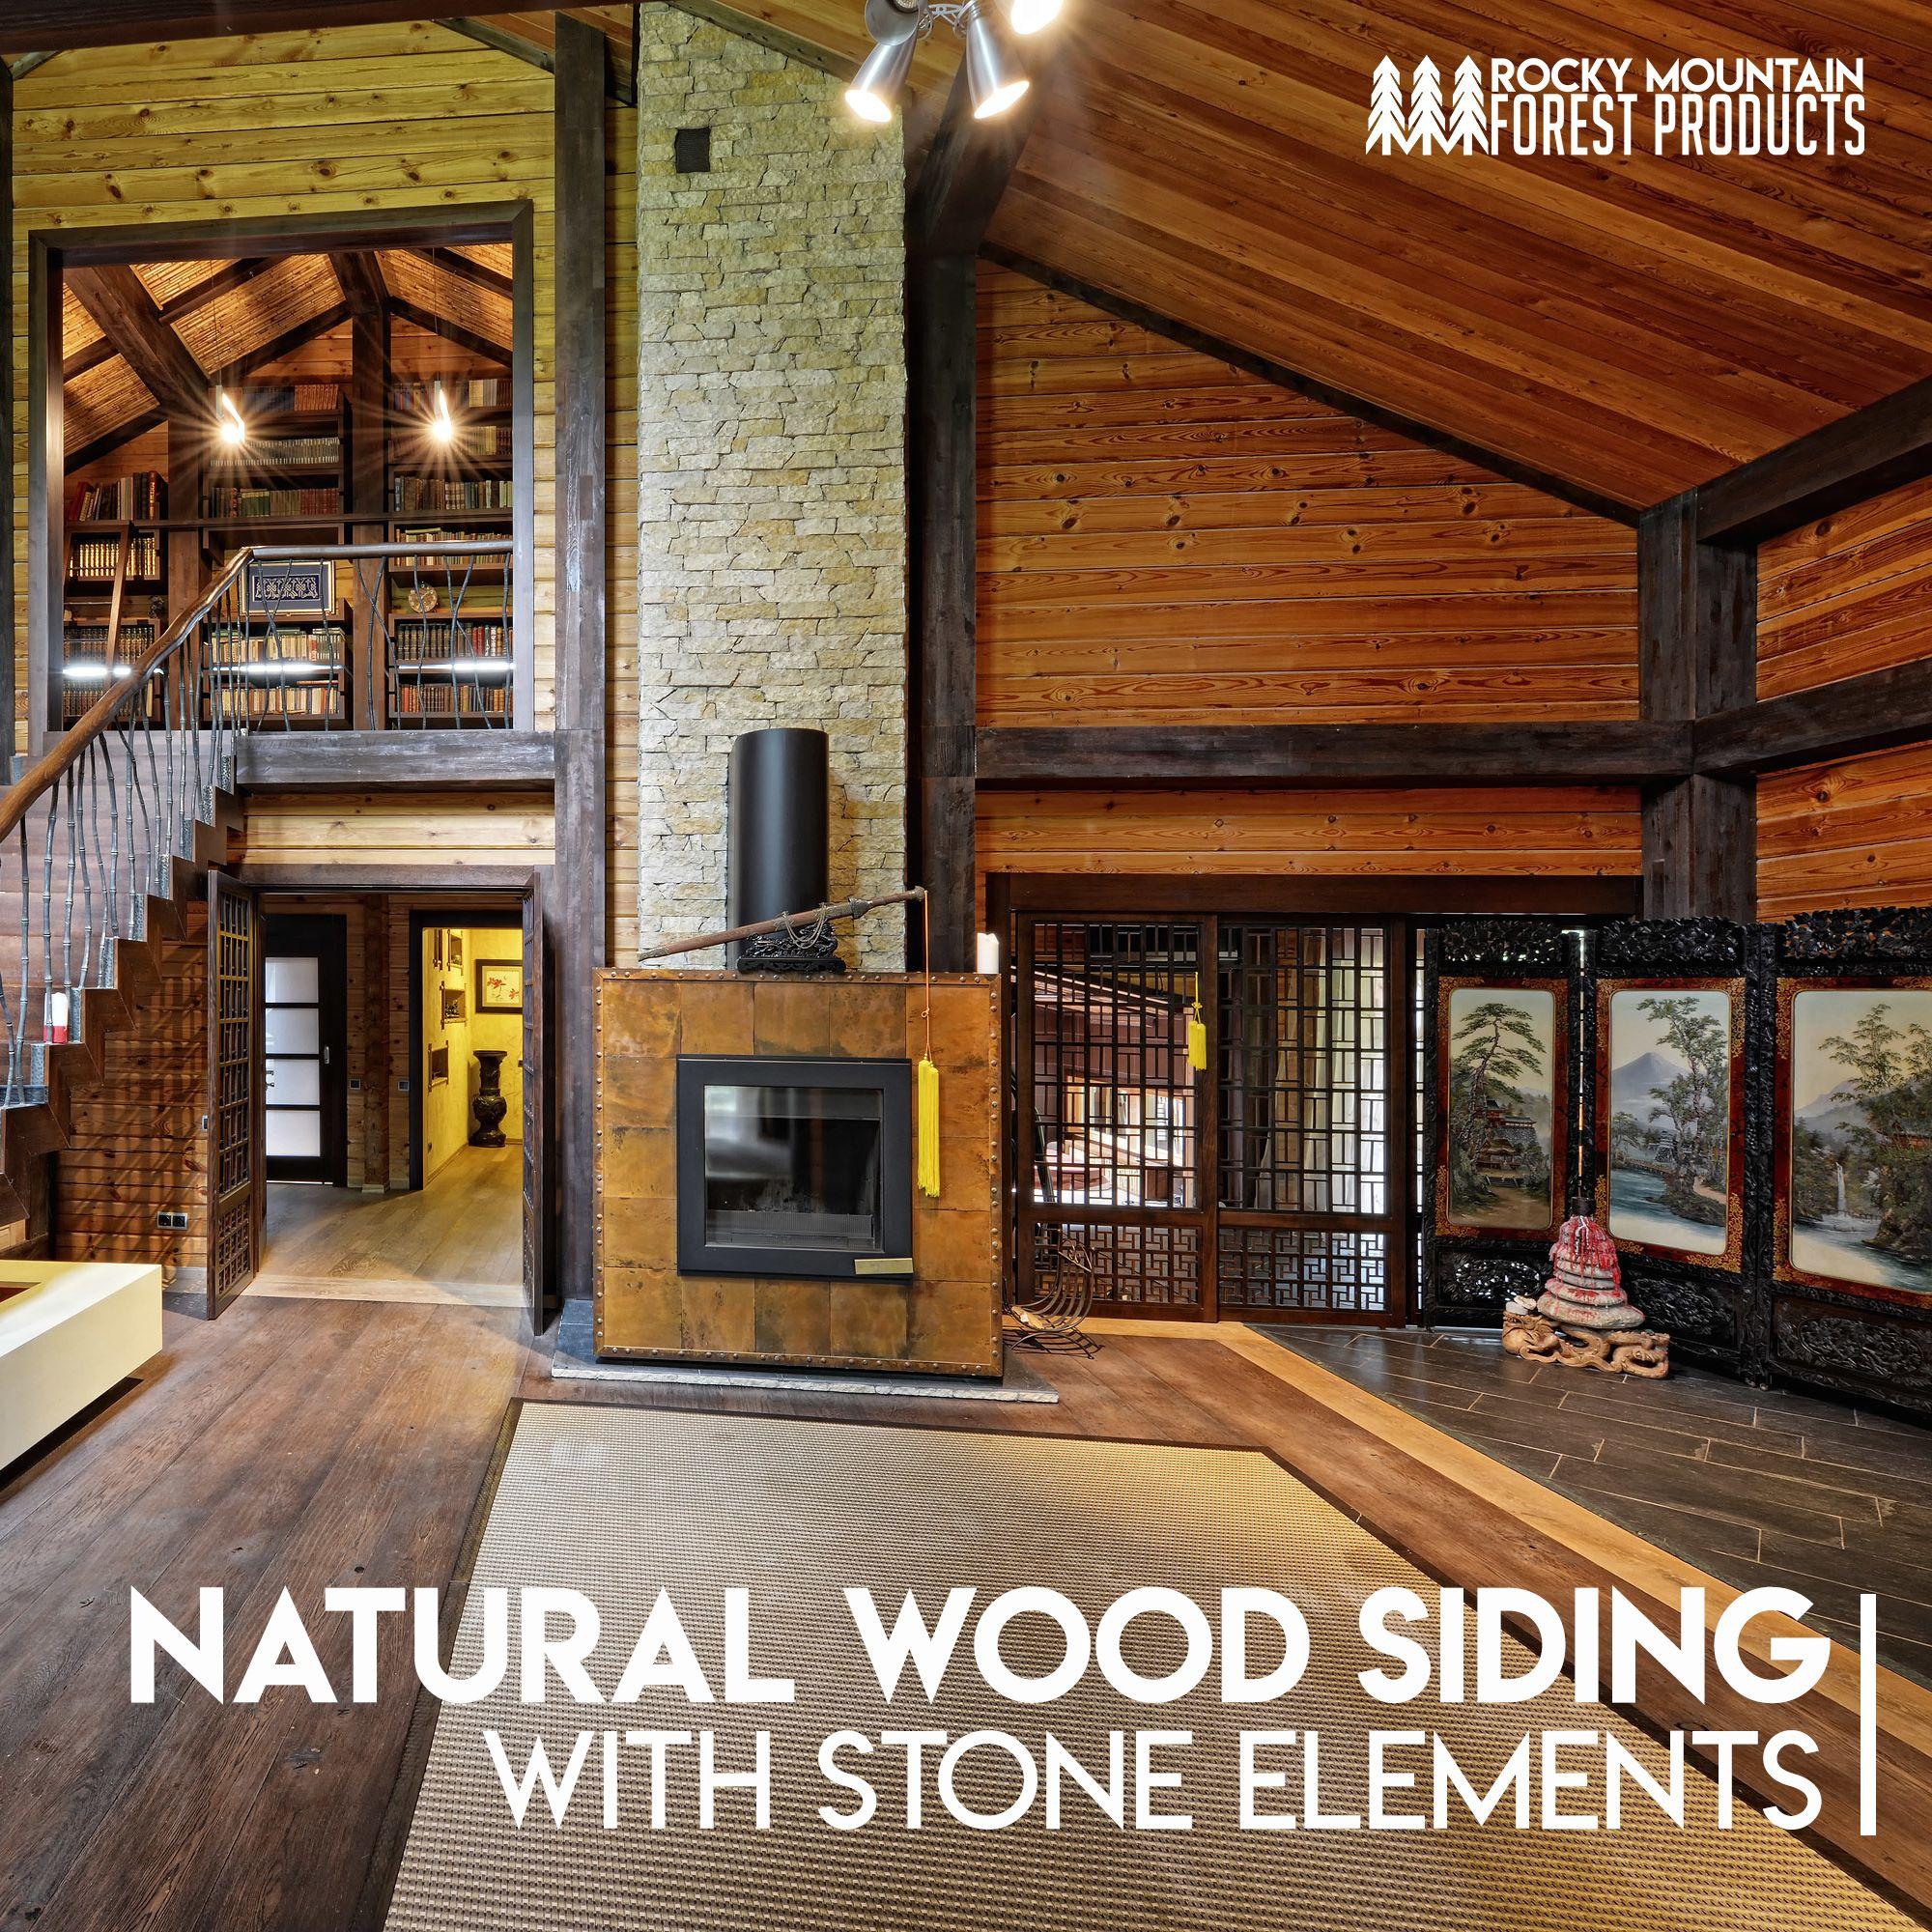 Natural Wood Siding Wood Siding Cedar Siding Architecture Fashion